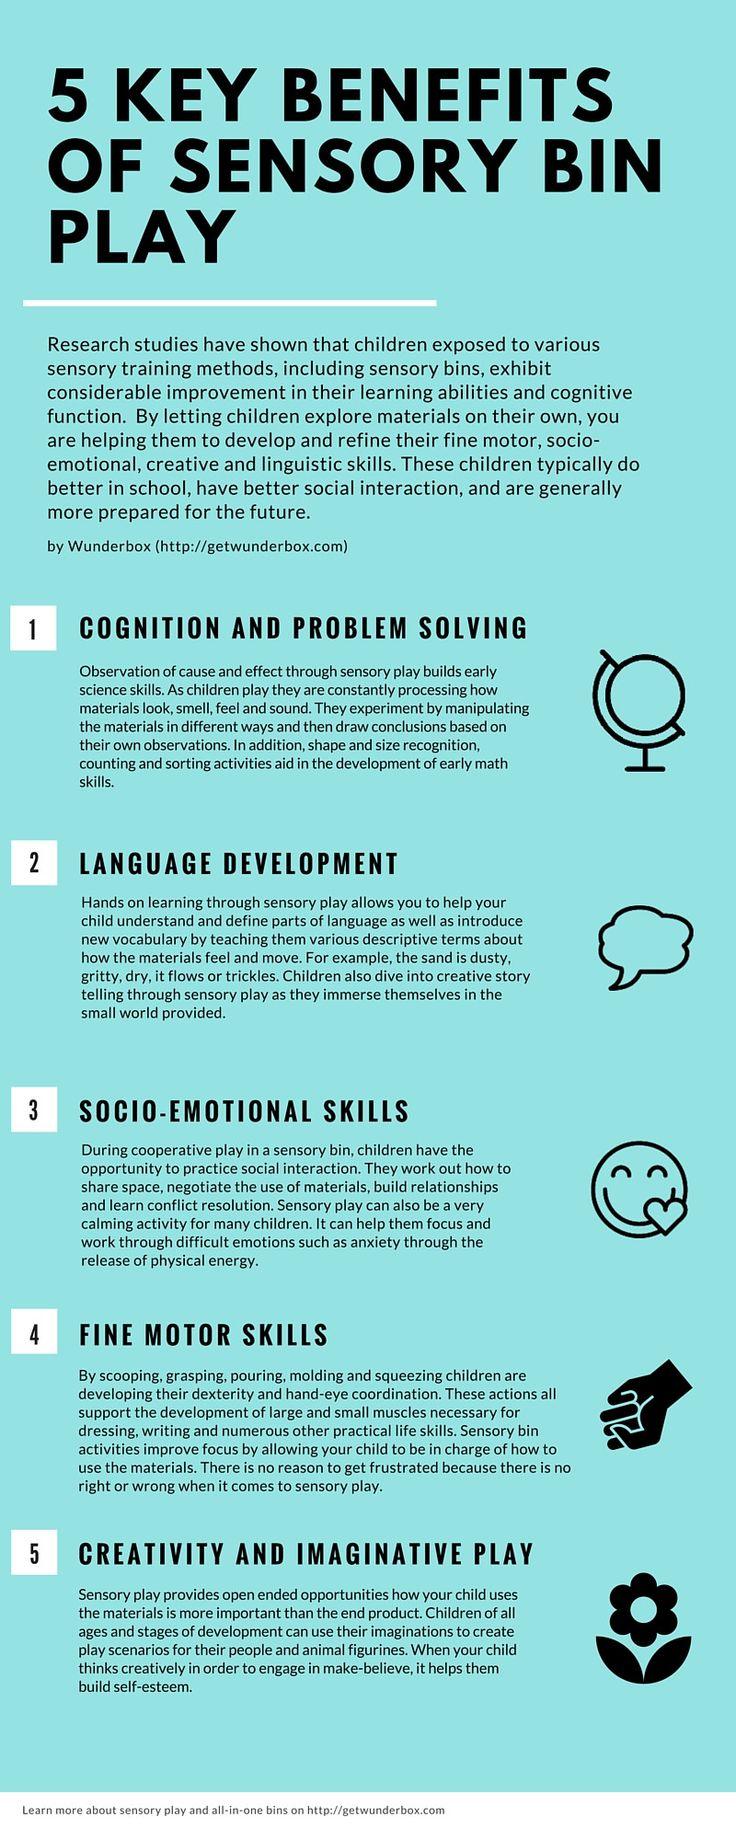 5 Key Benefits of Sensory Bin Play - Infographic